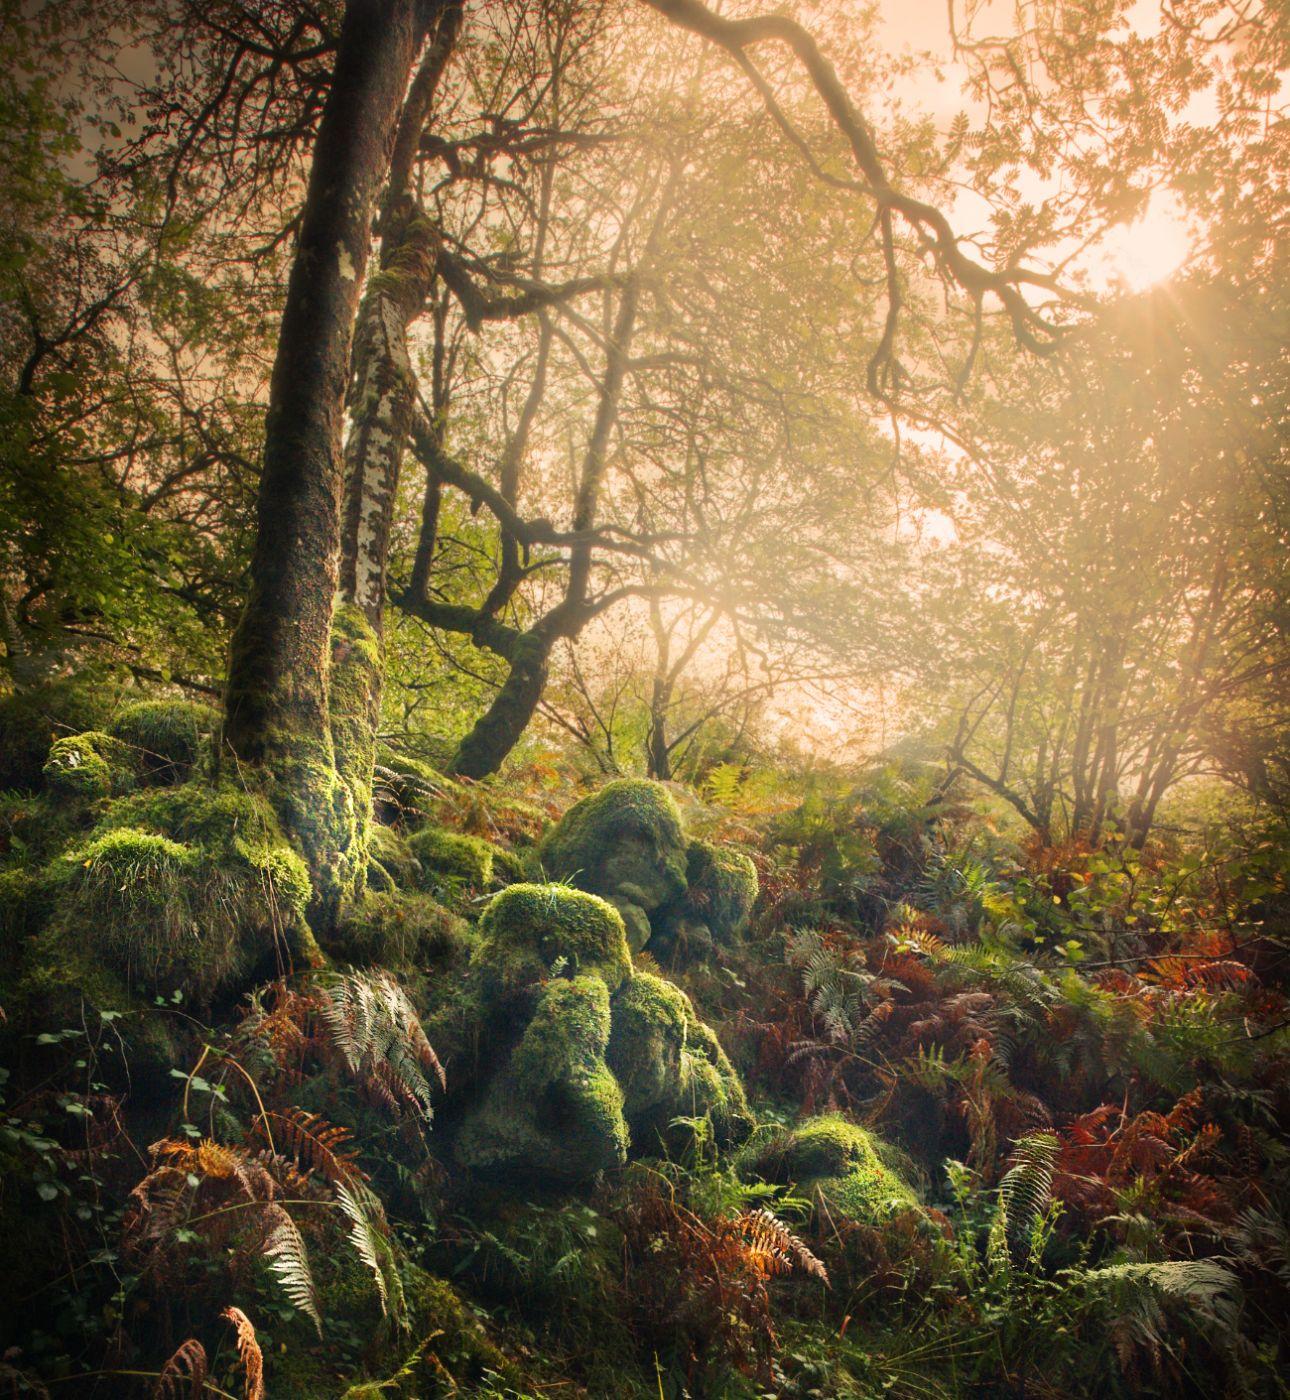 Venford woods, United Kingdom